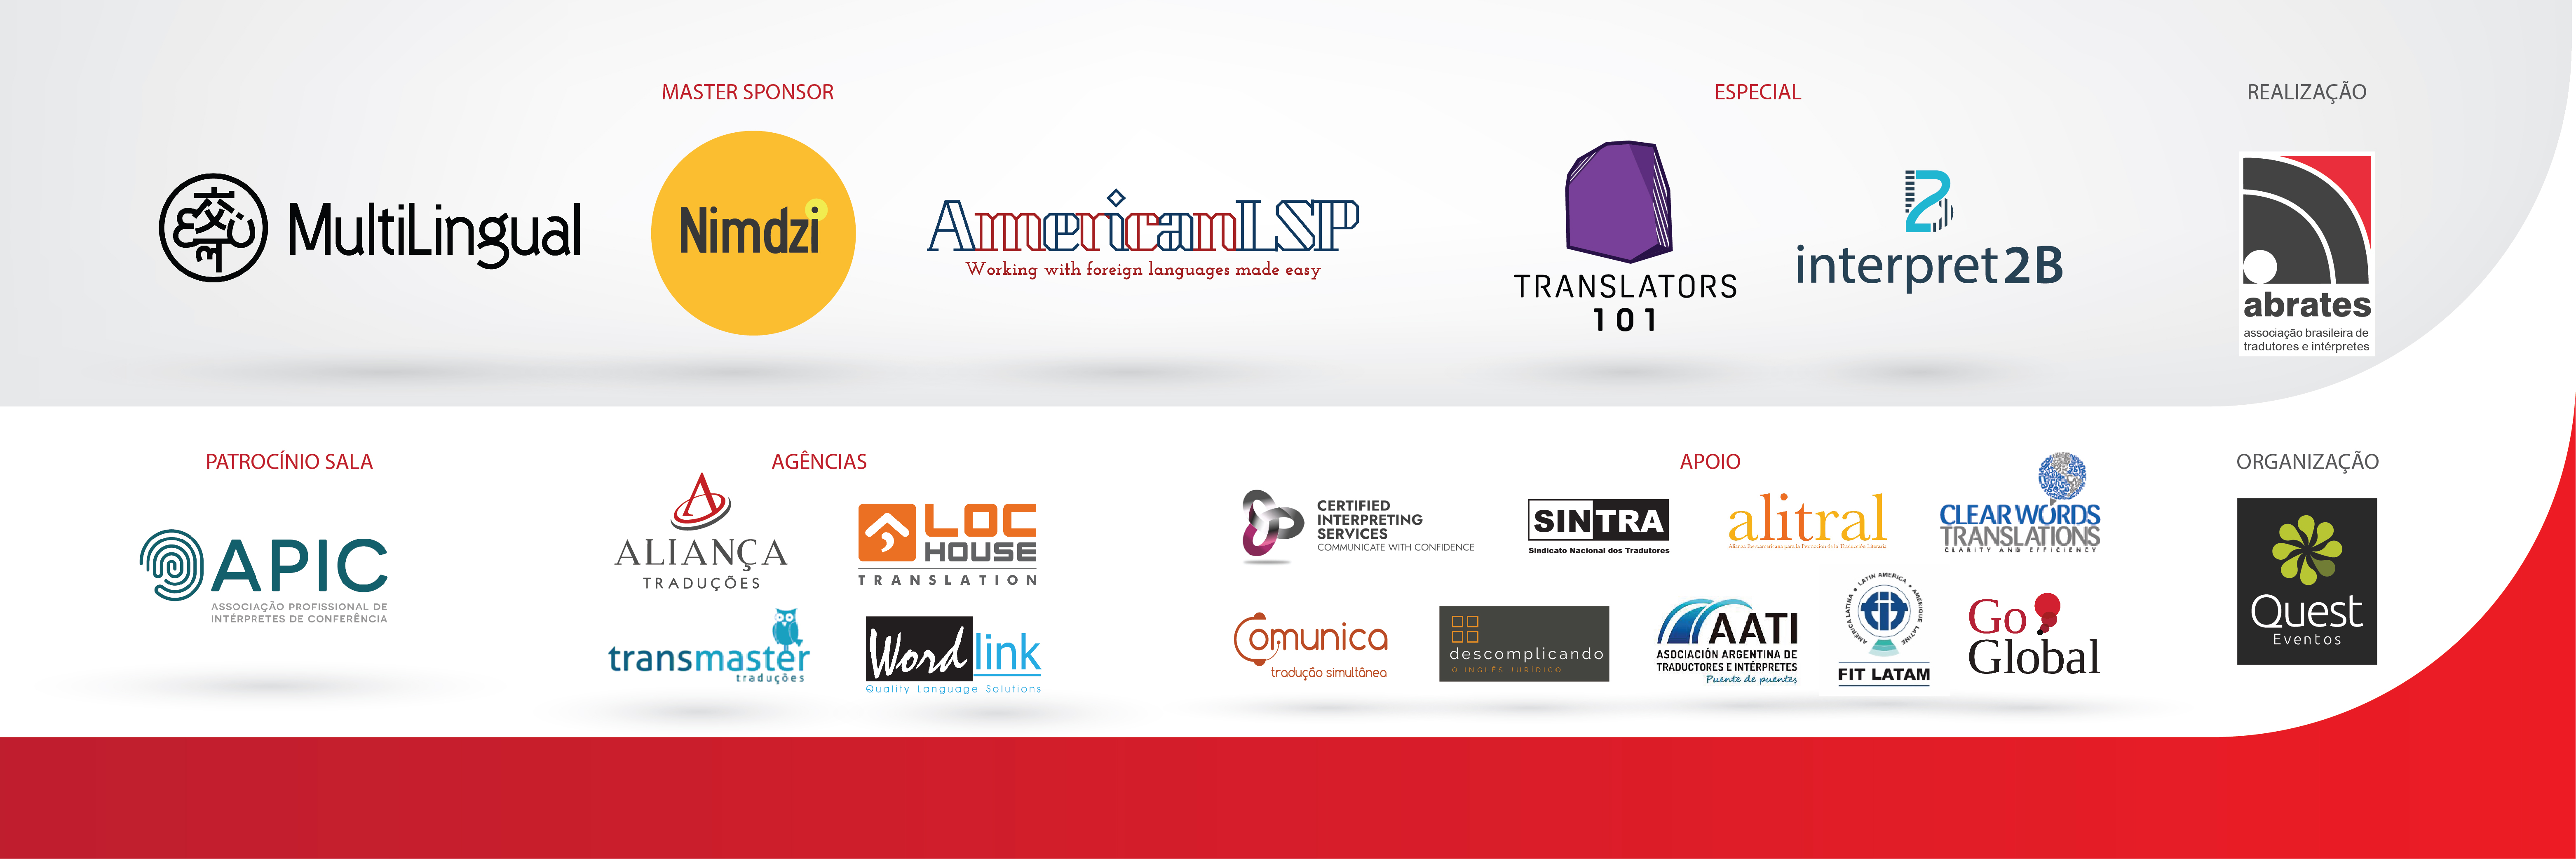 patrocinadores-sponsors